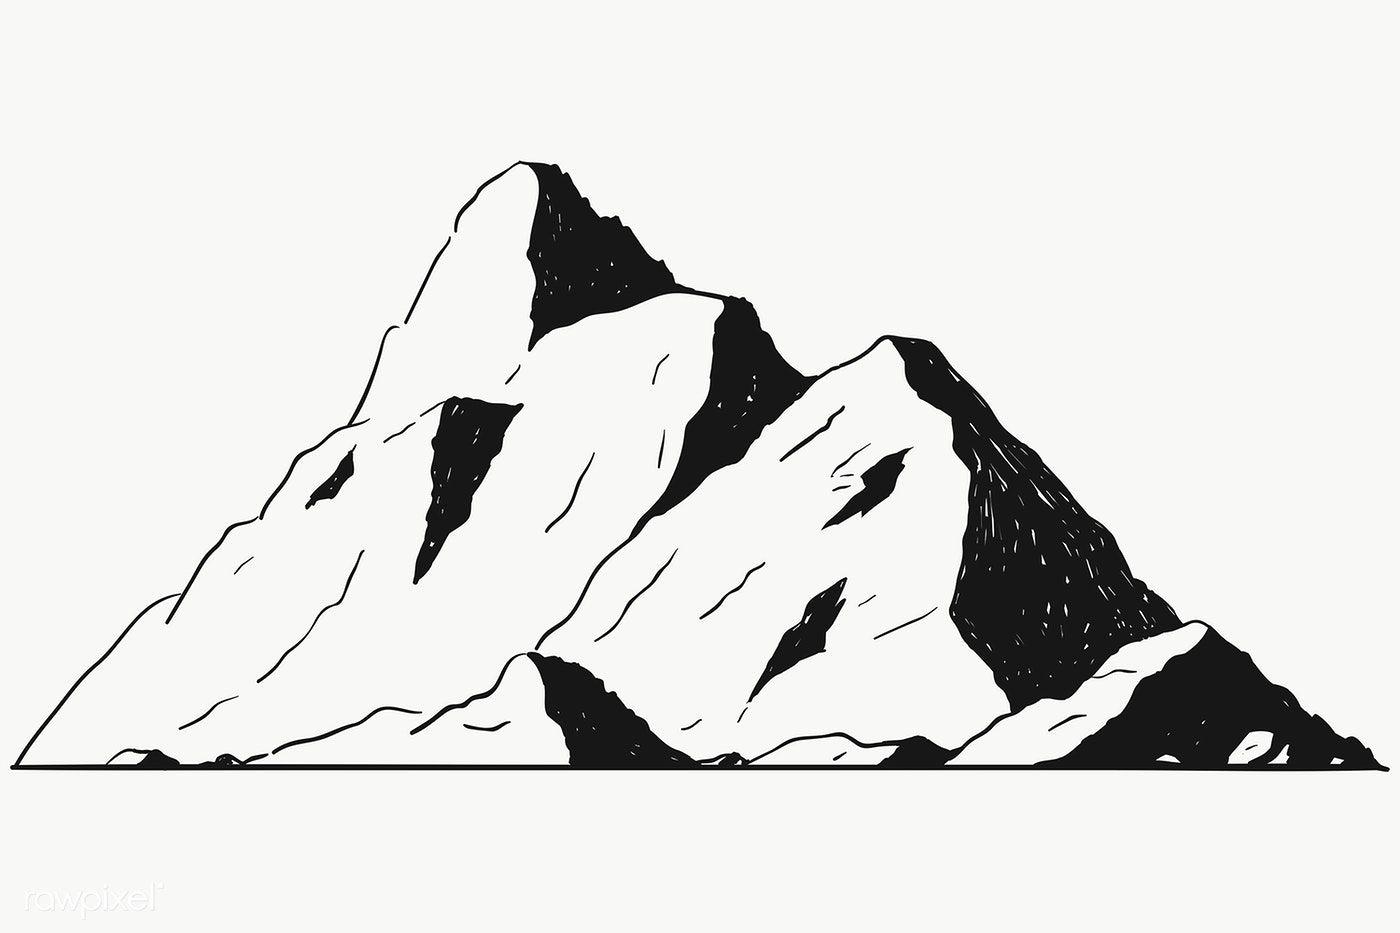 Mountain Shape For Logo Transparent Png Premium Image By Rawpixel Com Te Image Rock Mountain Aesthetic Mountain Drawing